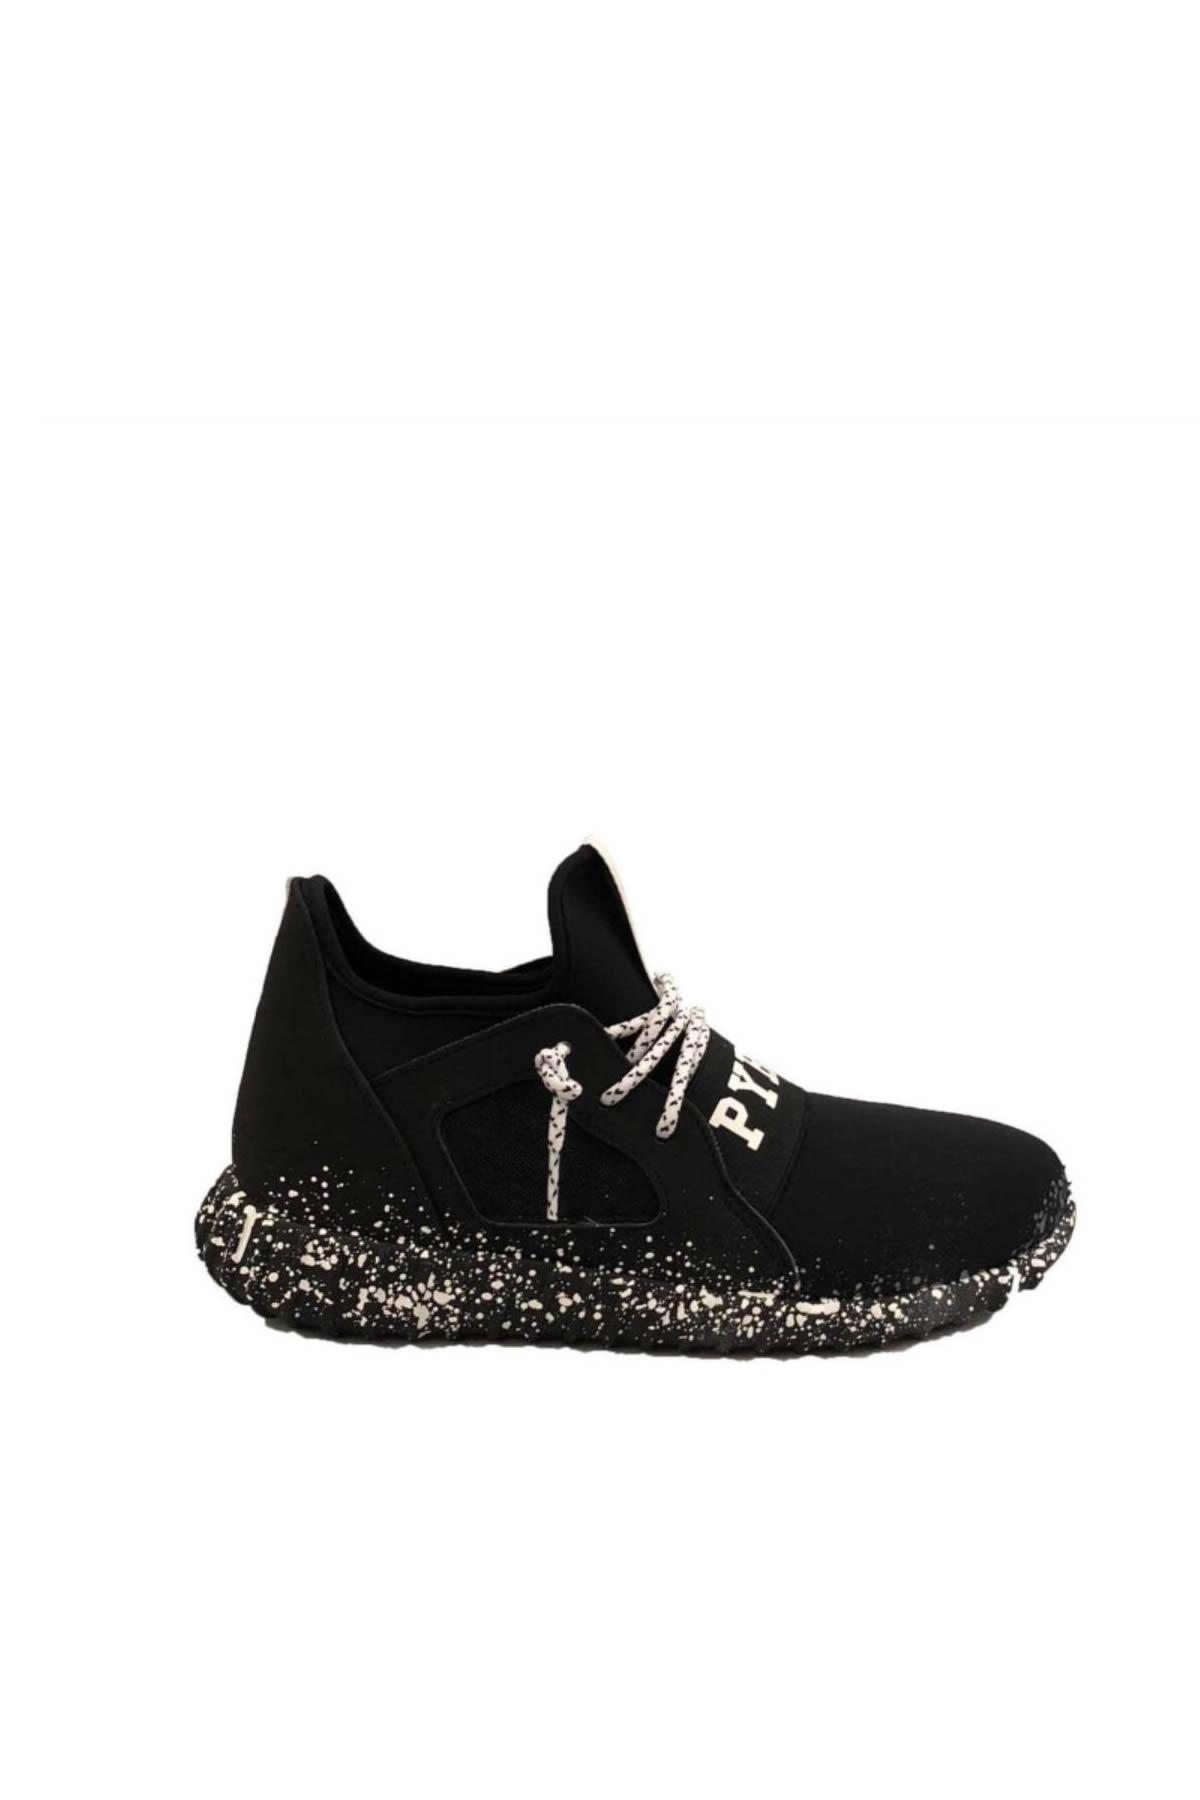 best sneakers 3e352 cf529 Pyrex - Scarpe Uomo